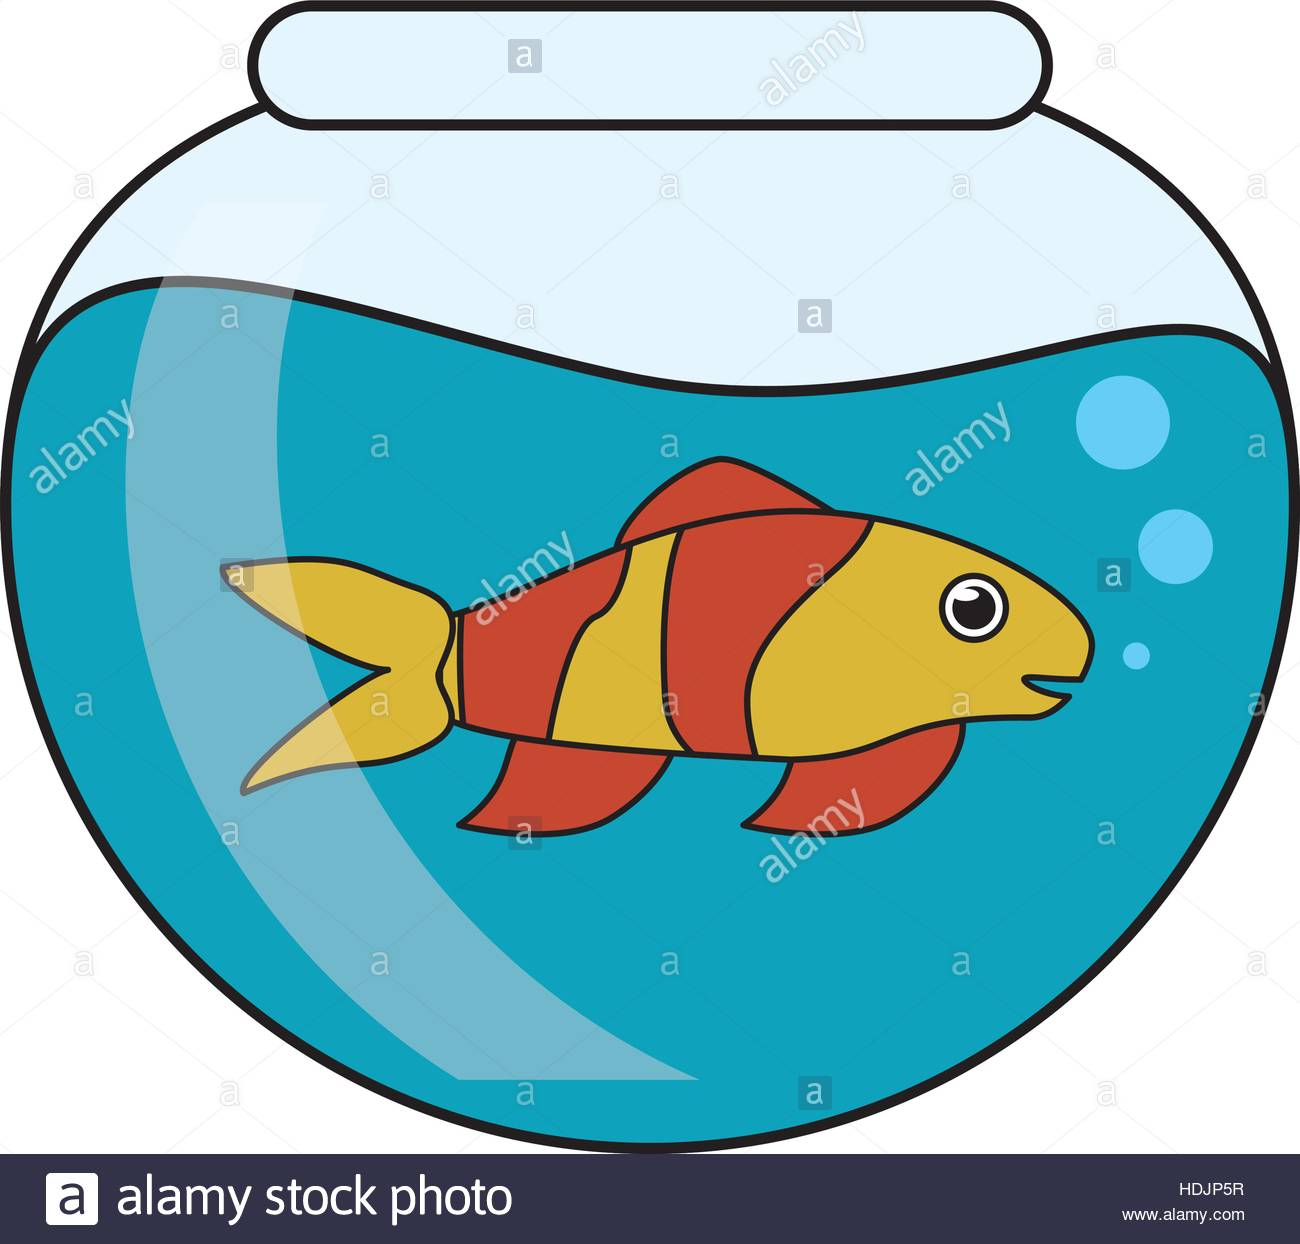 1300x1244 Fish Animal Cartoon Inside Bowl Design Stock Vector Art